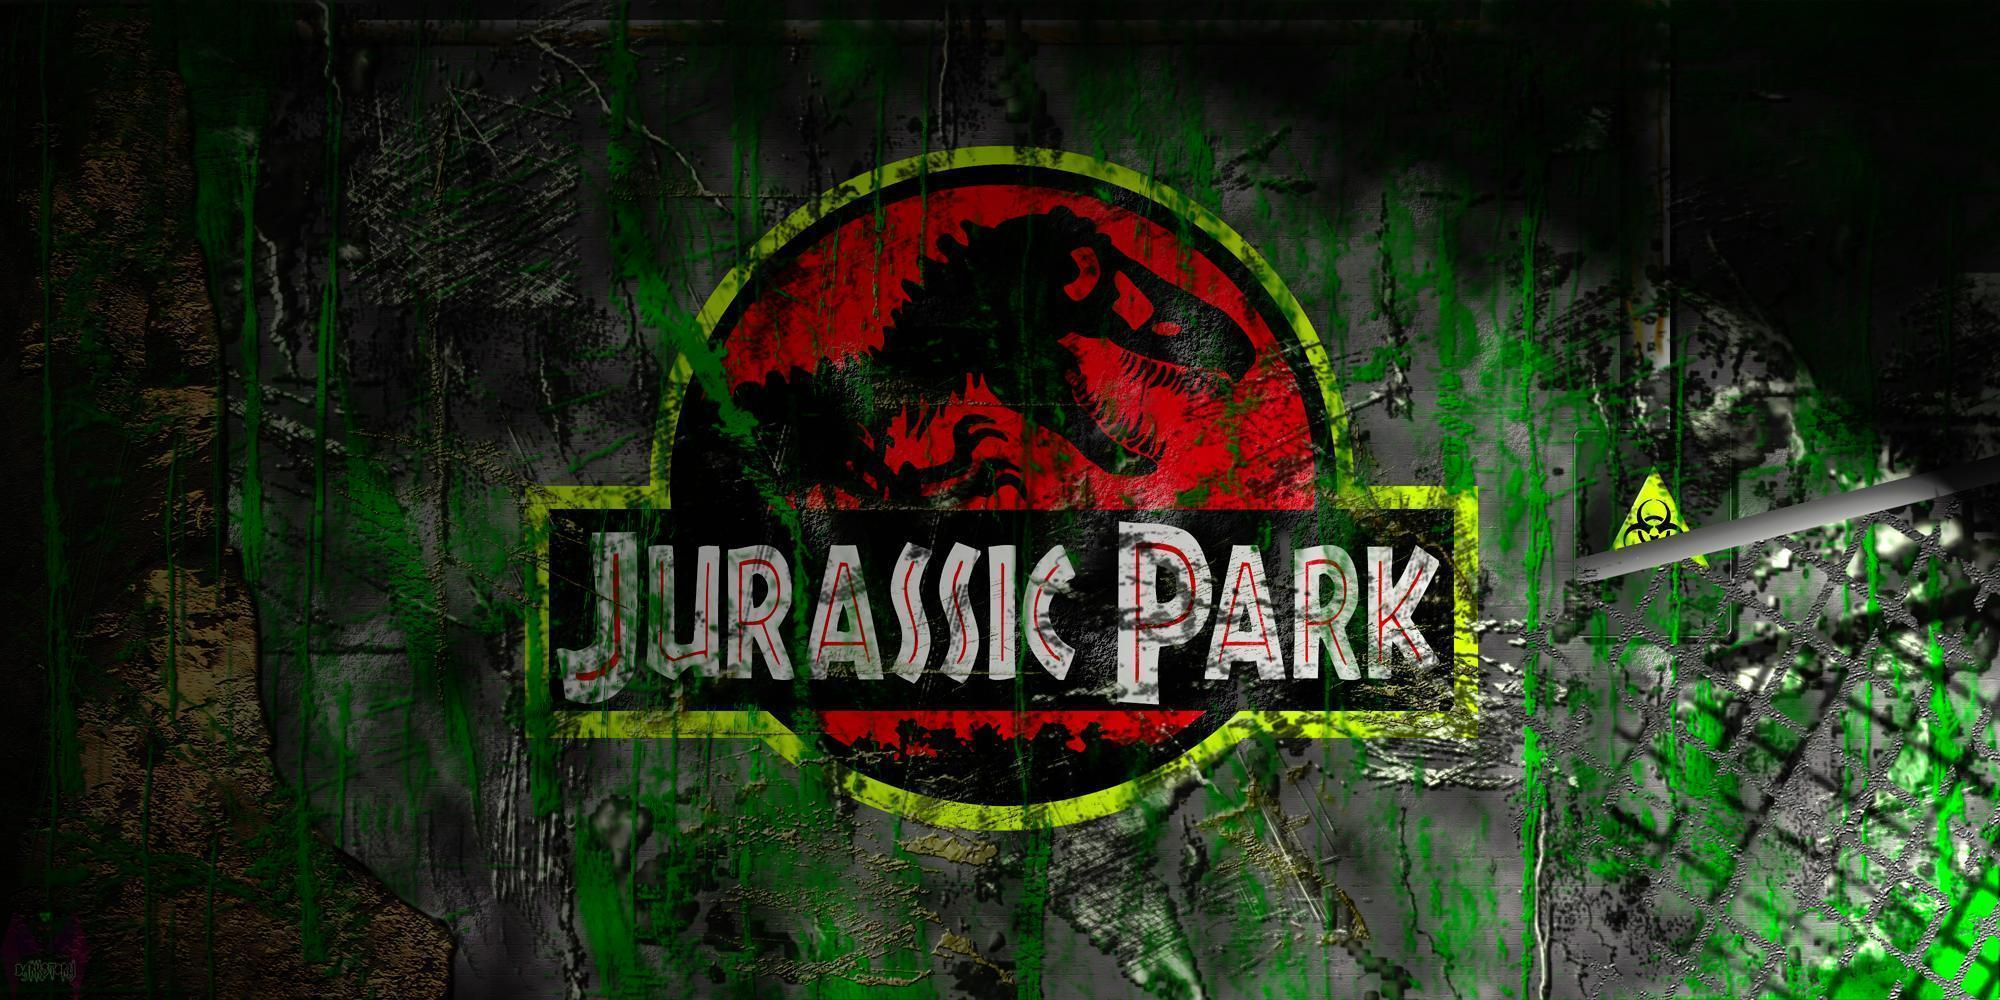 Jurassic park wallpapers wallpaper cave for Puerta jurassic world